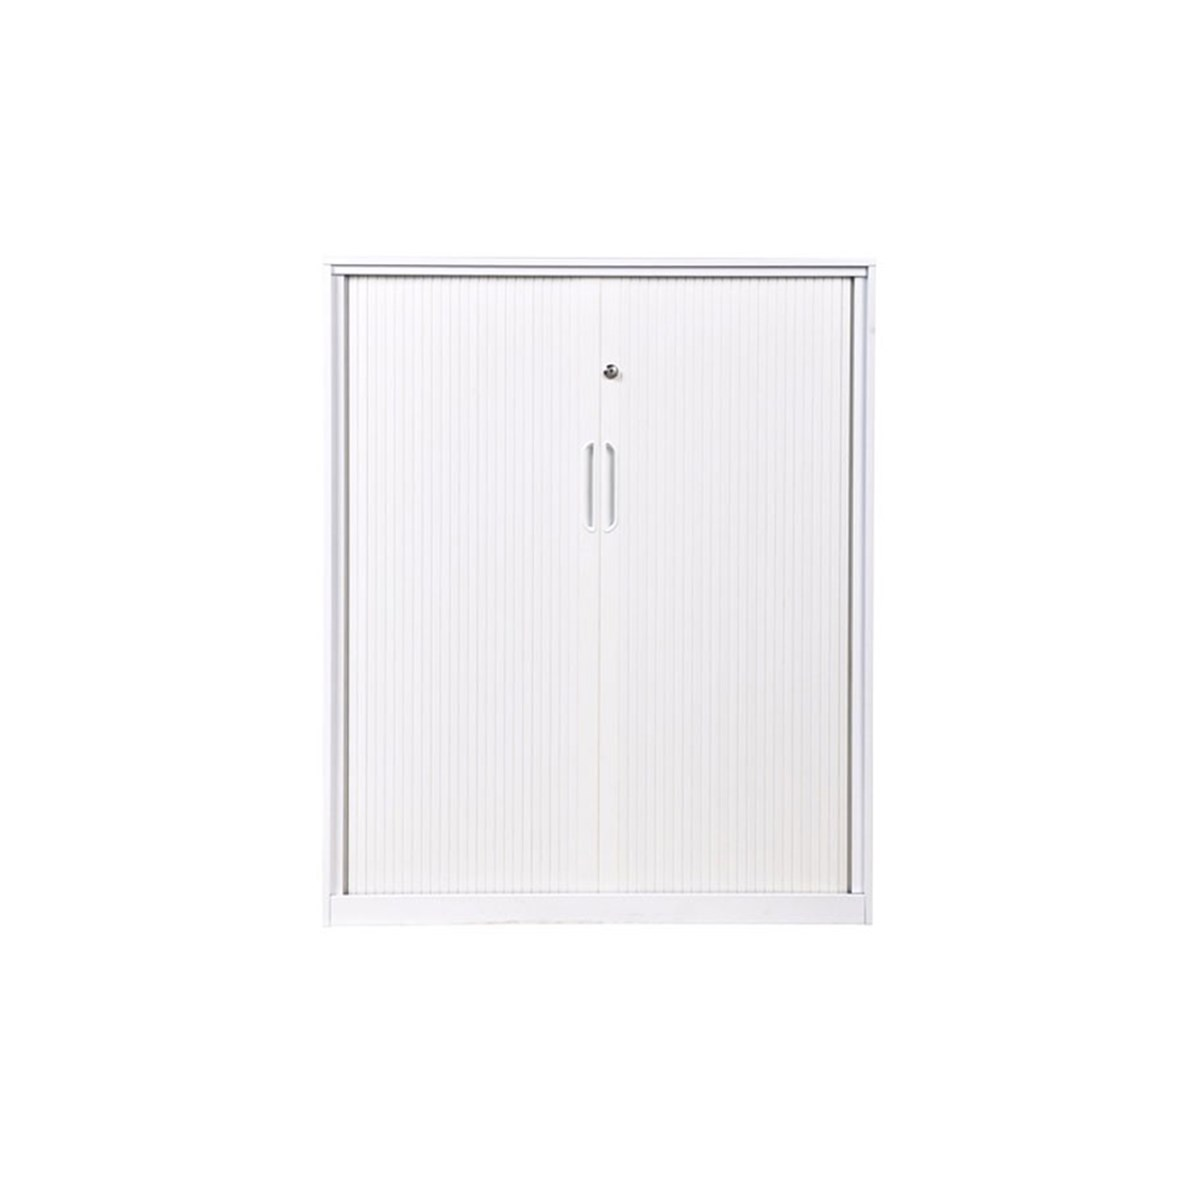 Neospace-Tambour-Cabinet-Tall-Matisse-1